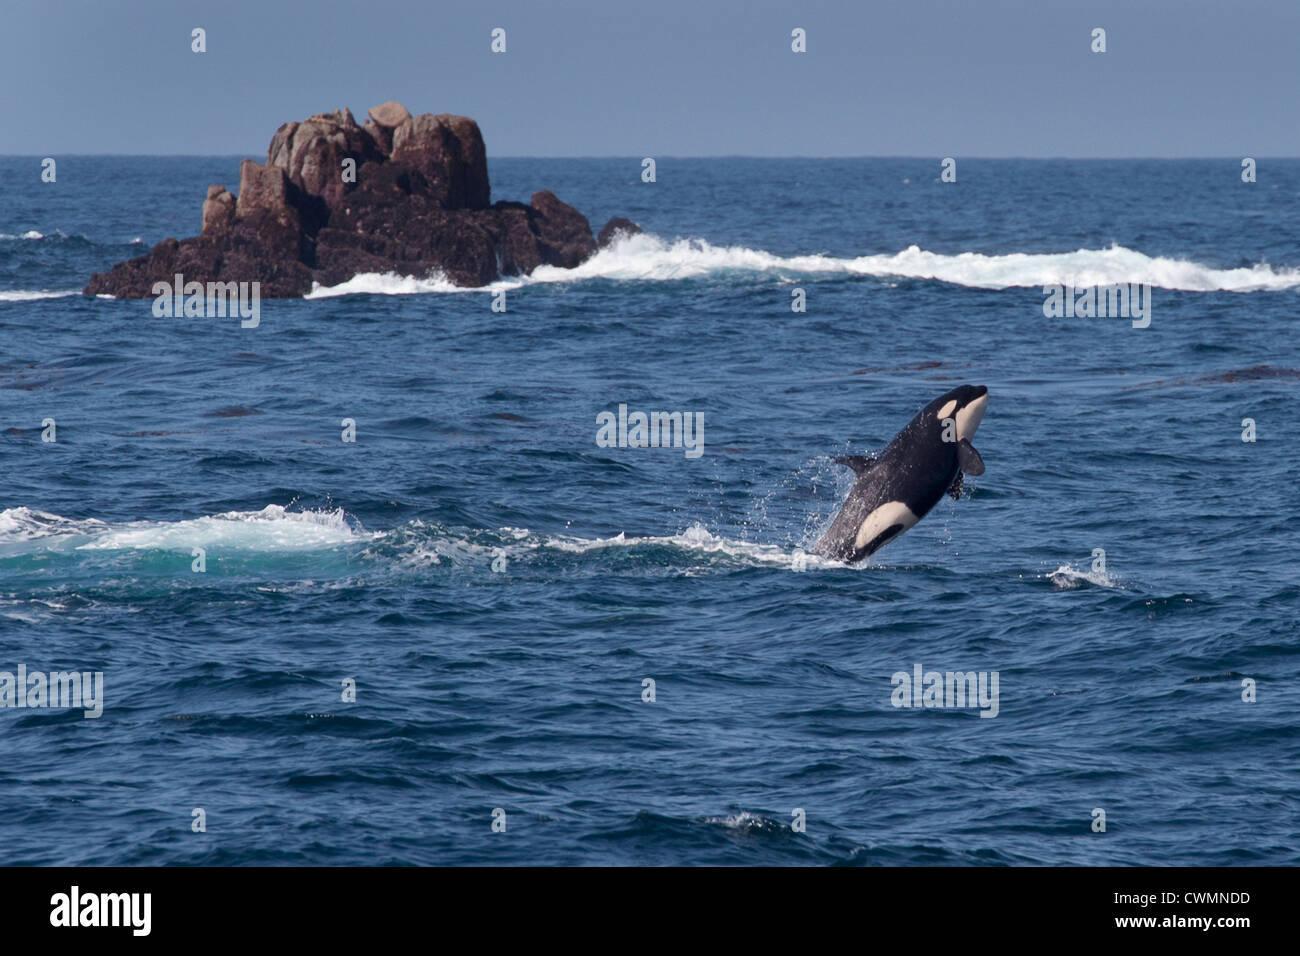 Juvenile Transient Killer Whale or Orca (Orcinus orca), breaching, Monterey, California, Pacific Ocean. - Stock Image